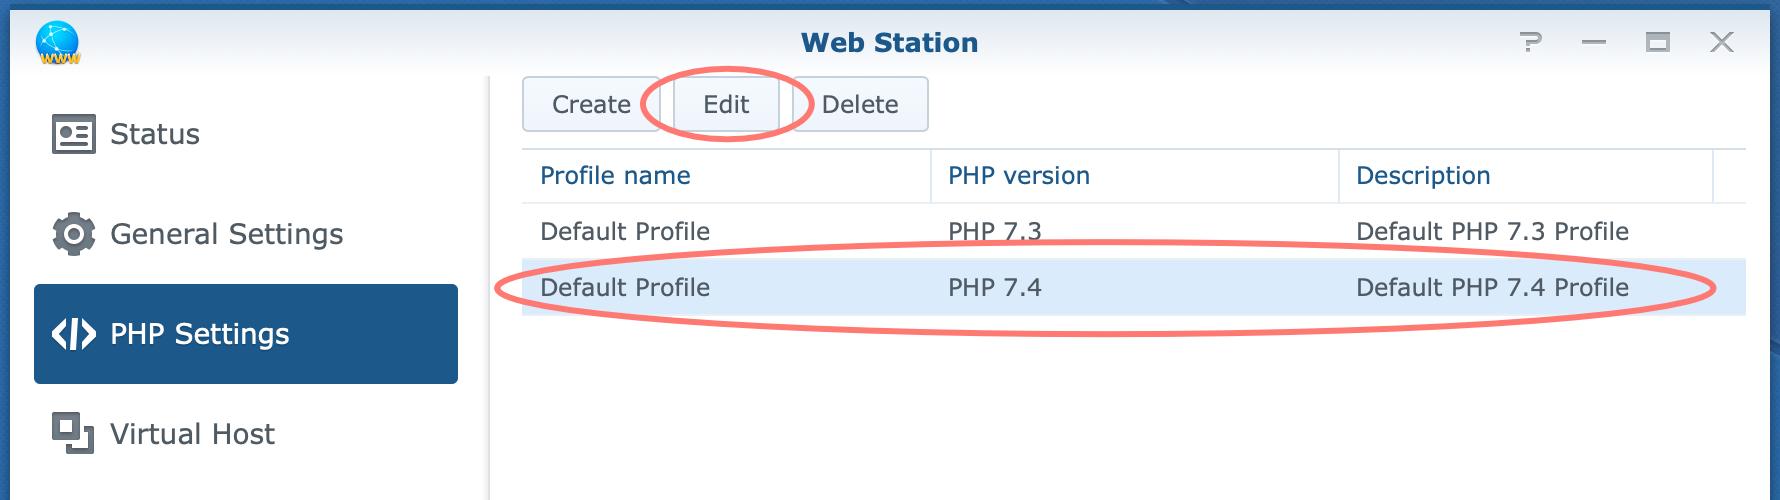 synology, web station, php settings, dsm6